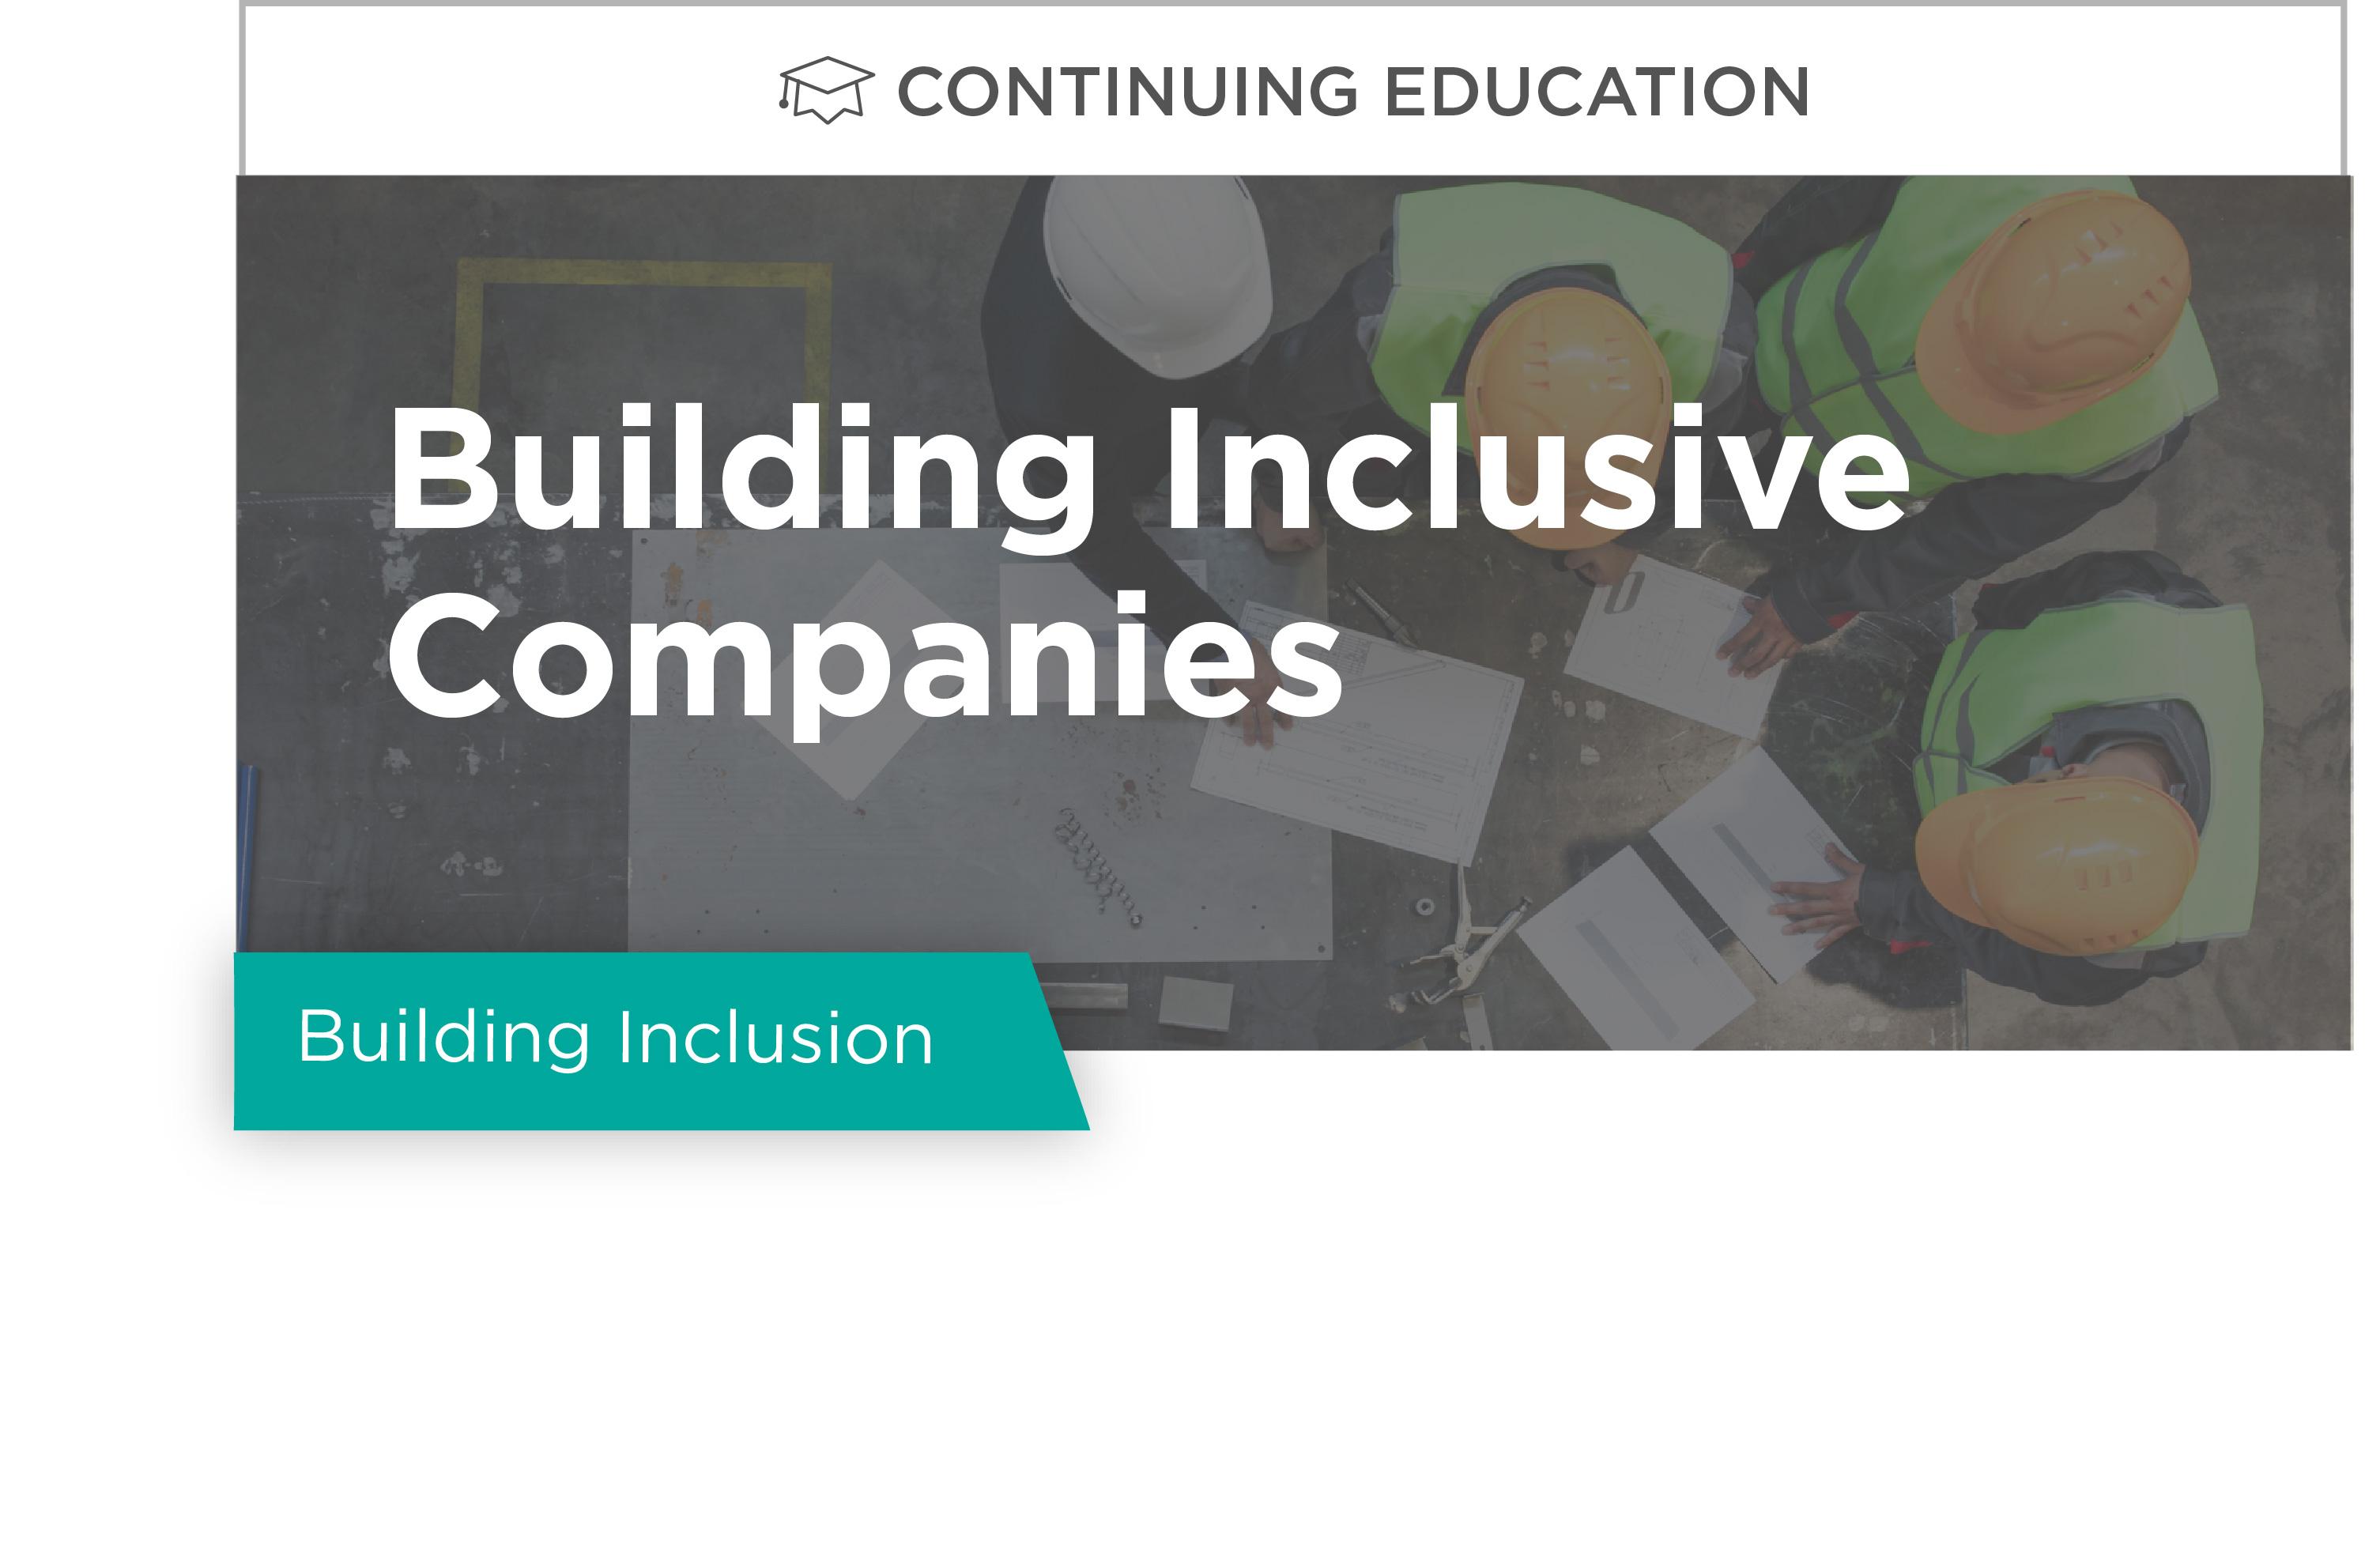 Building Inclusion: Building Inclusive Companies